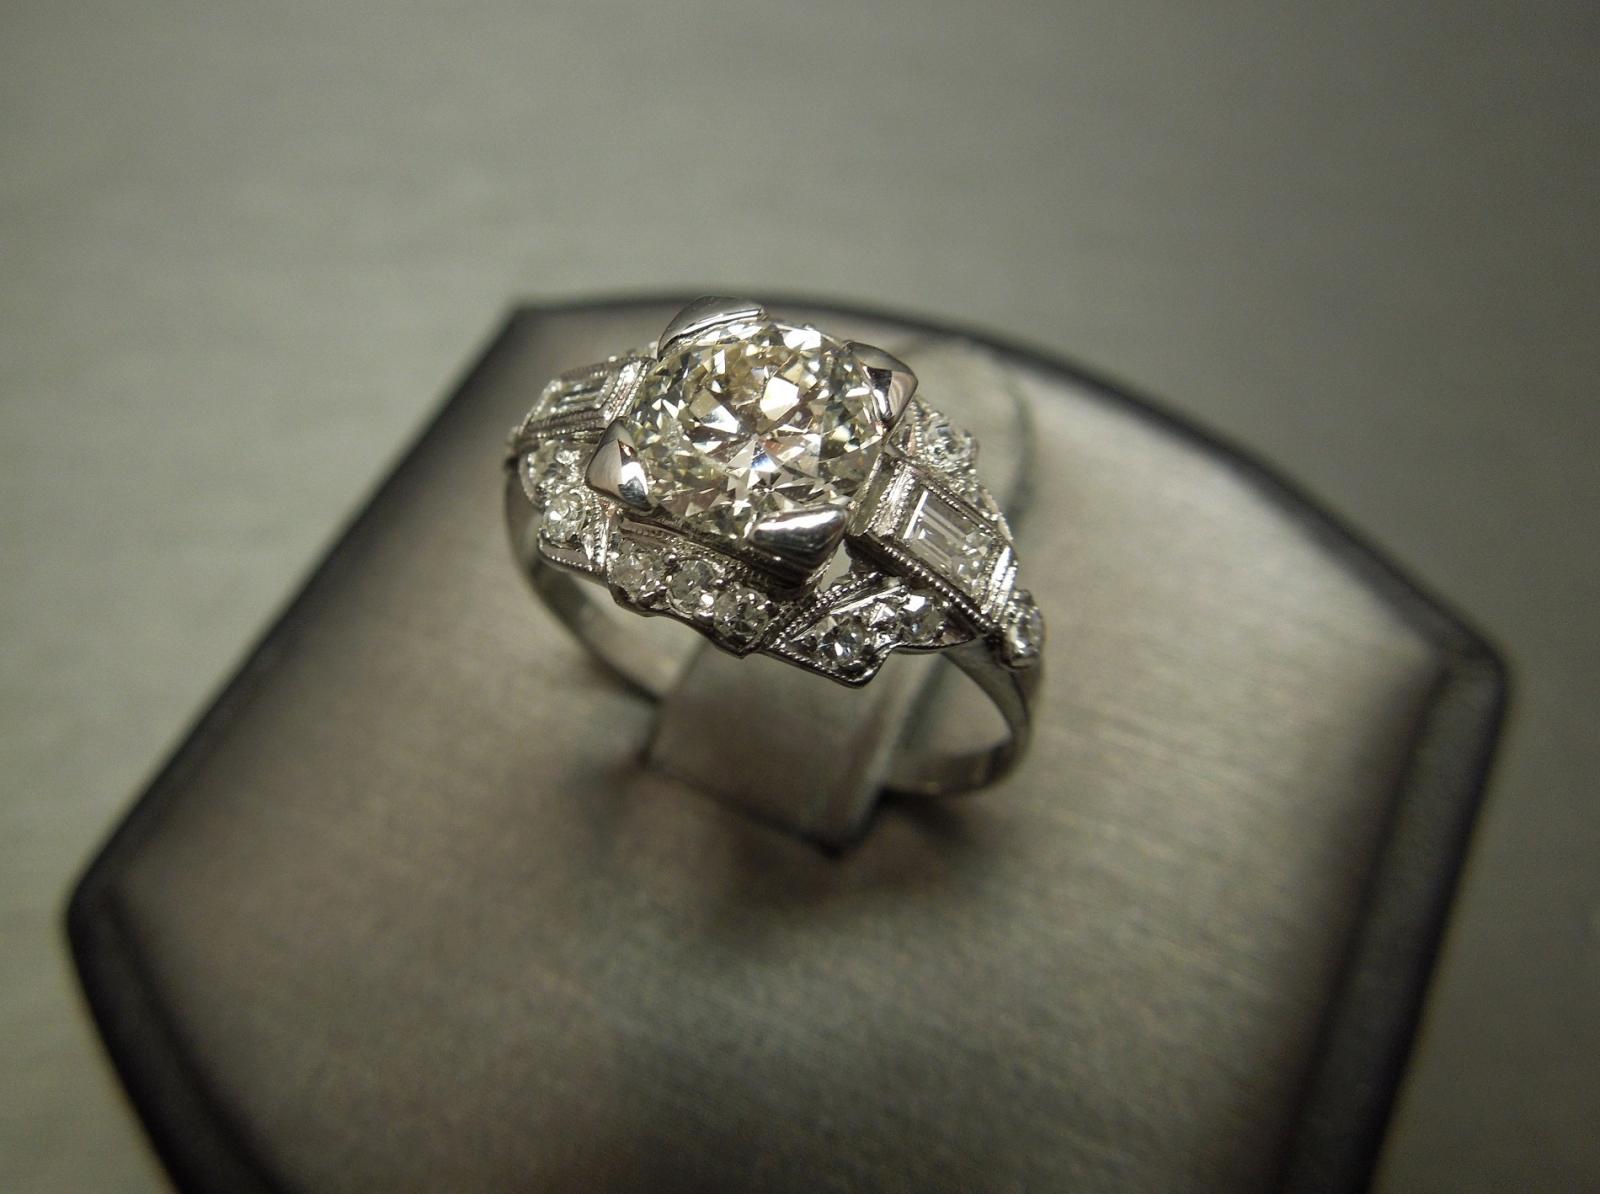 Antique Old European Cut Diamond Engagement Ring 1 21tcw Plat